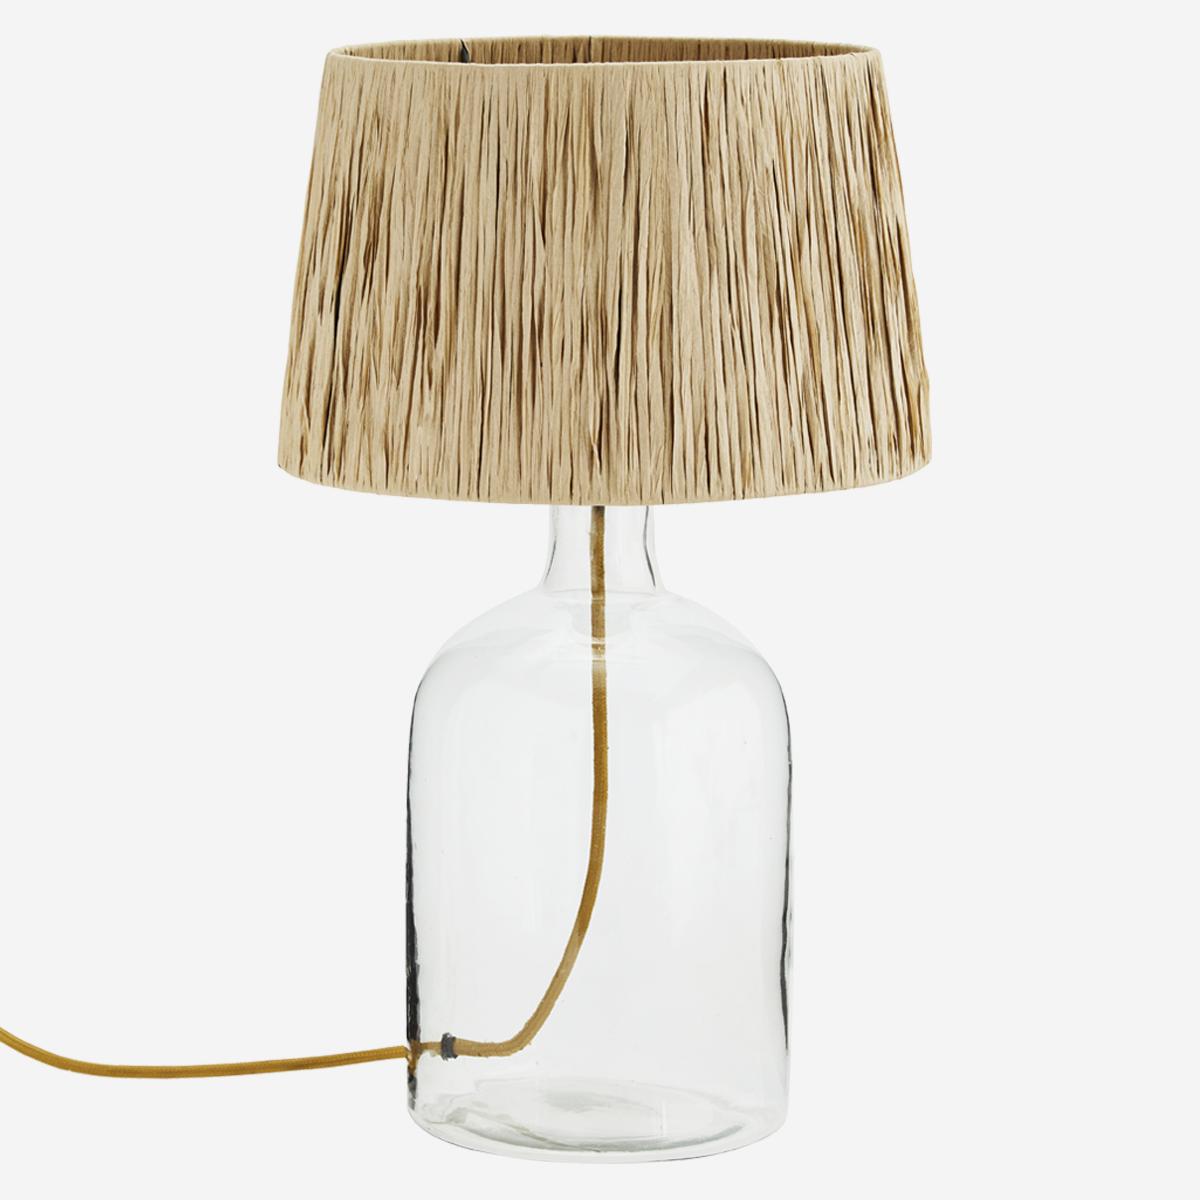 Madam Stoltz Lampe de bureau en verre, terre cuite / raphia - Ø30xh49cm